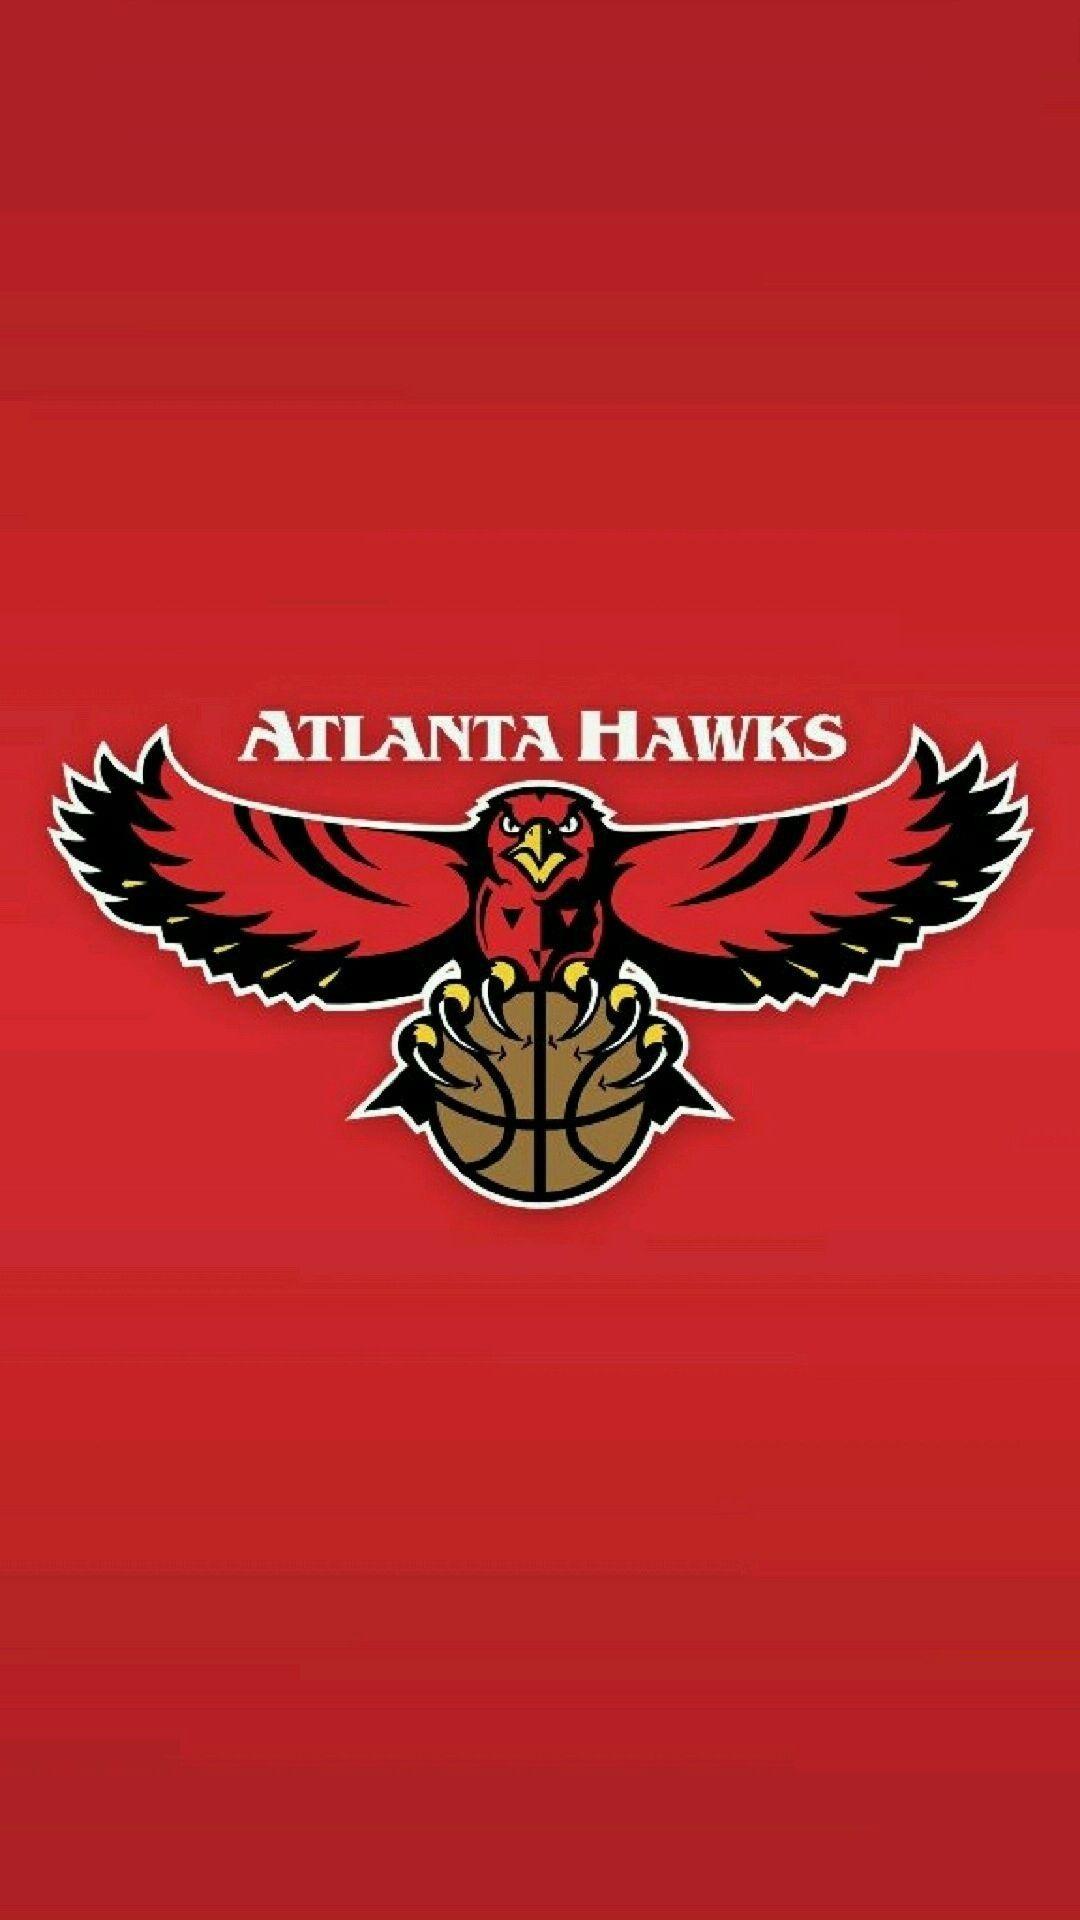 Atlanta Hawks iPhone 6s Plus Wallpaper   2020 NBA iPhone Wallpaper 1080x1920